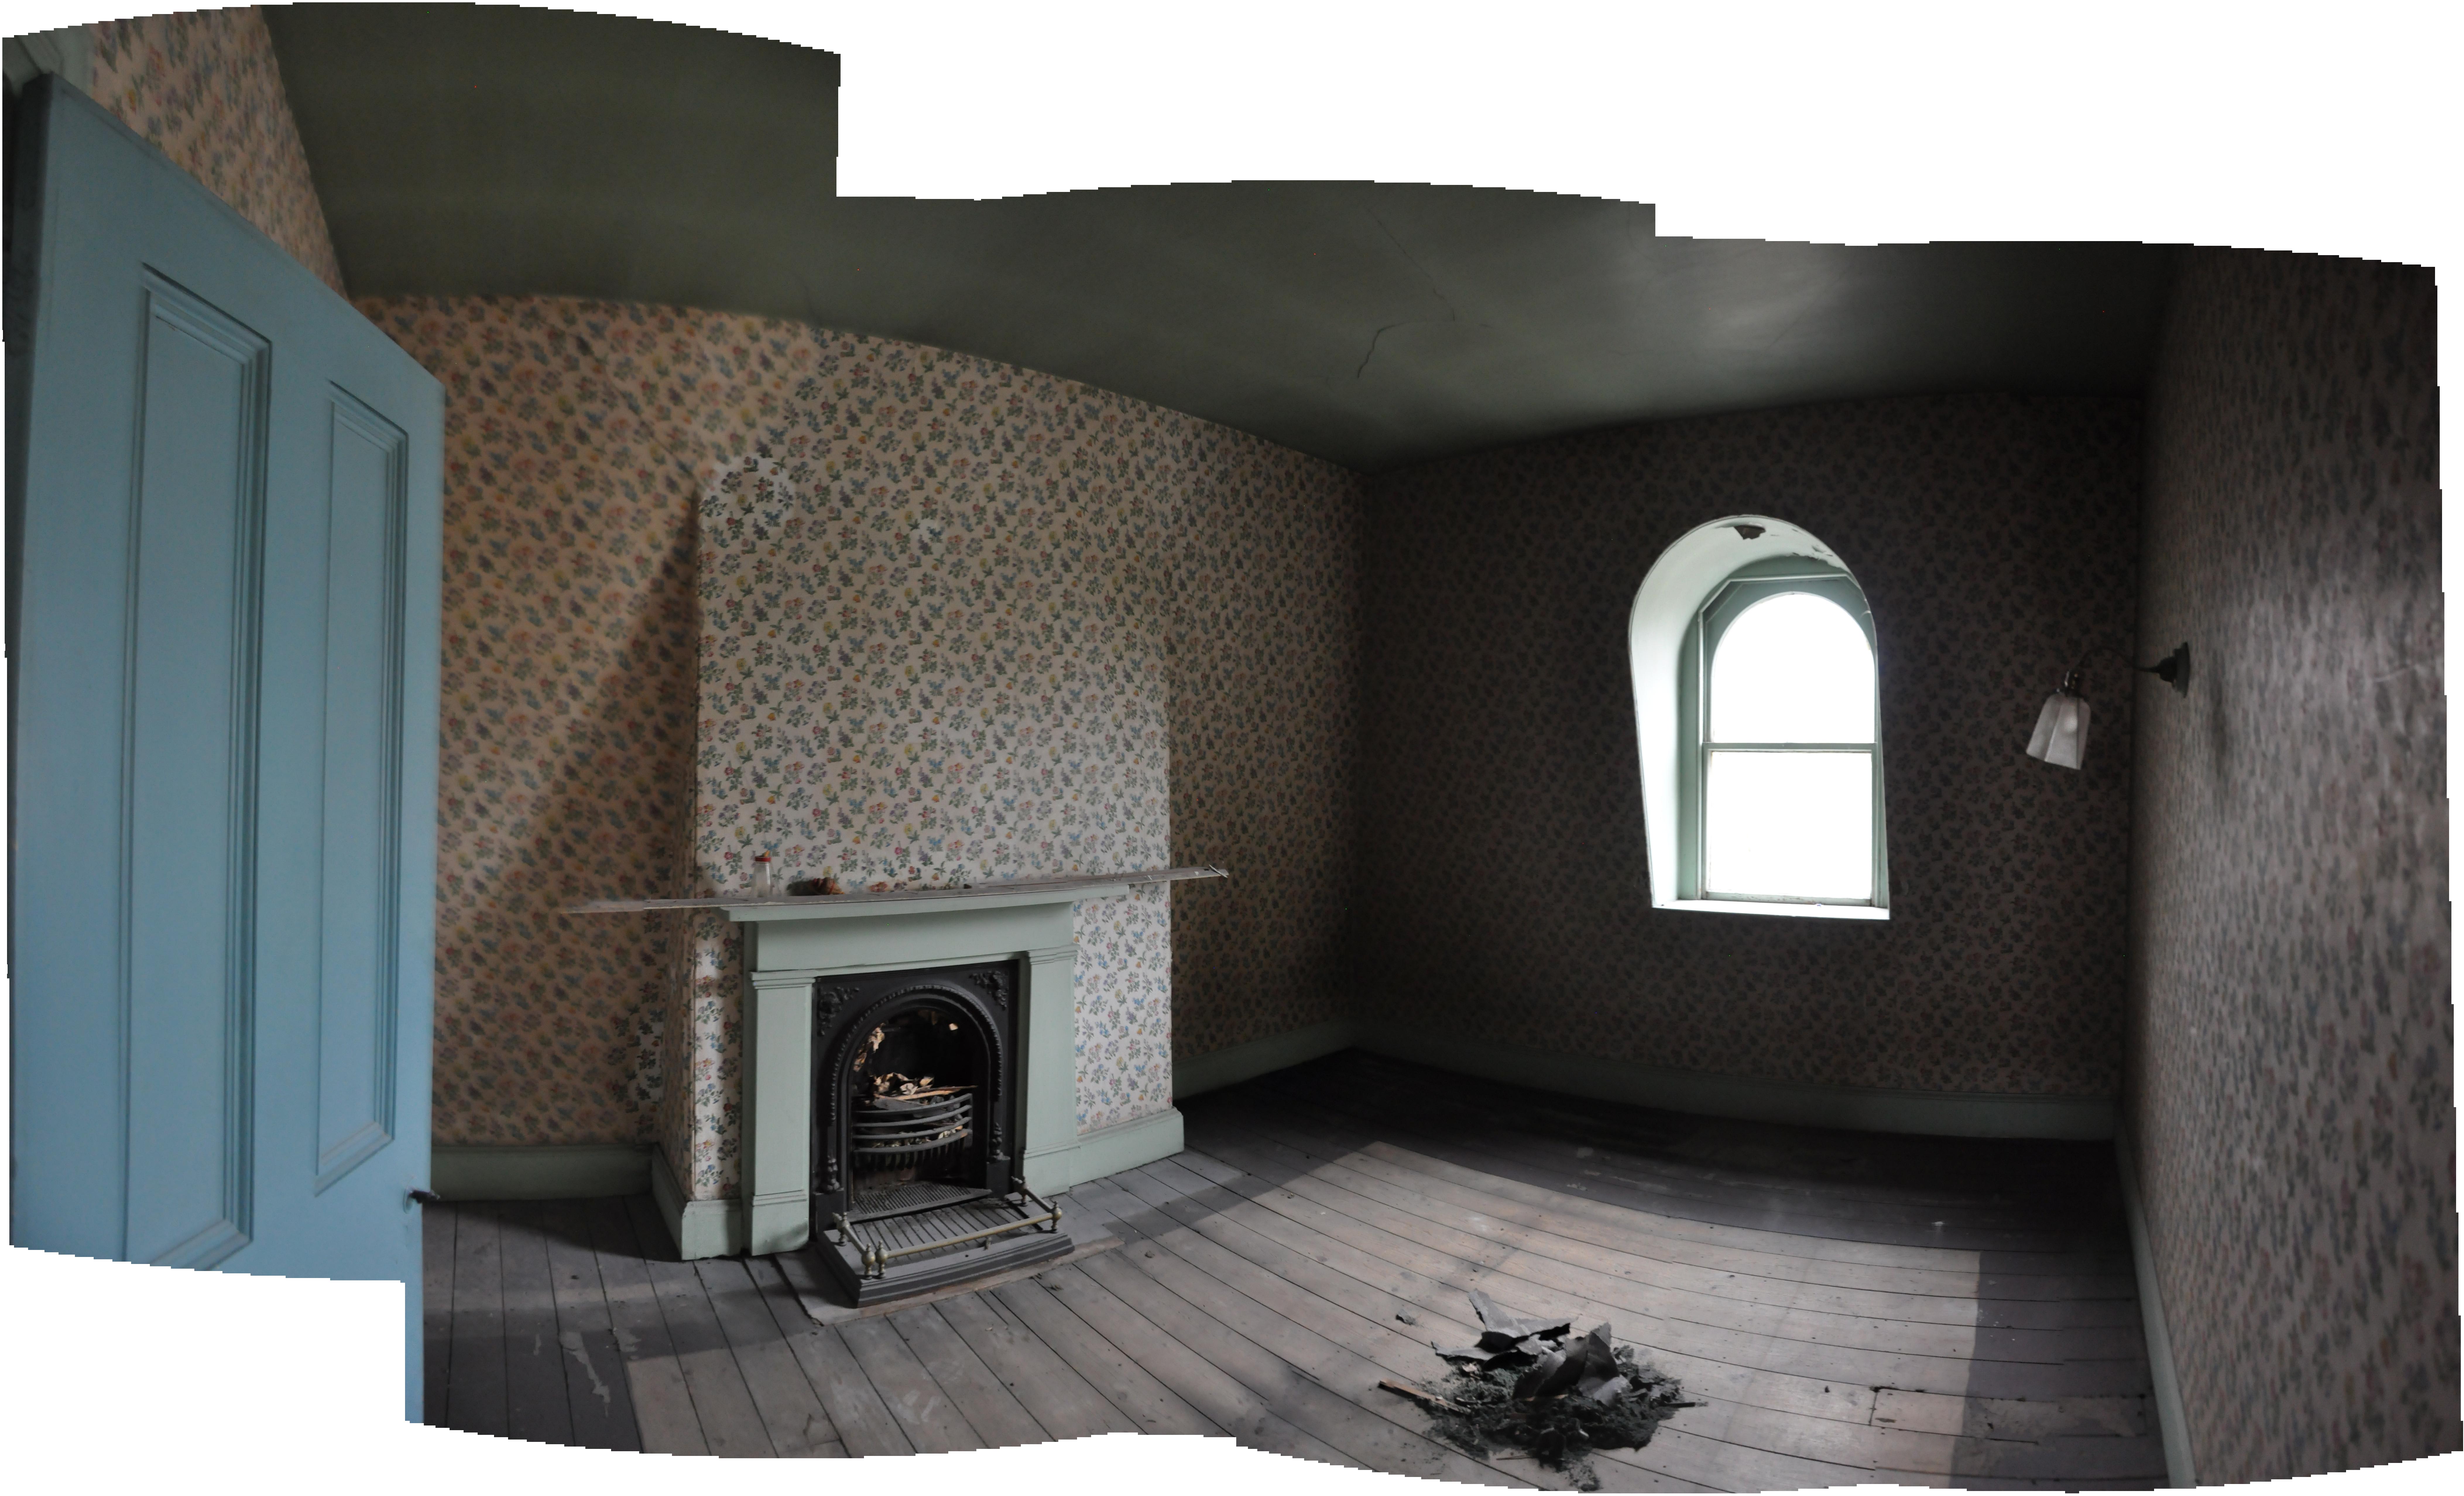 Renovation of Bedroom